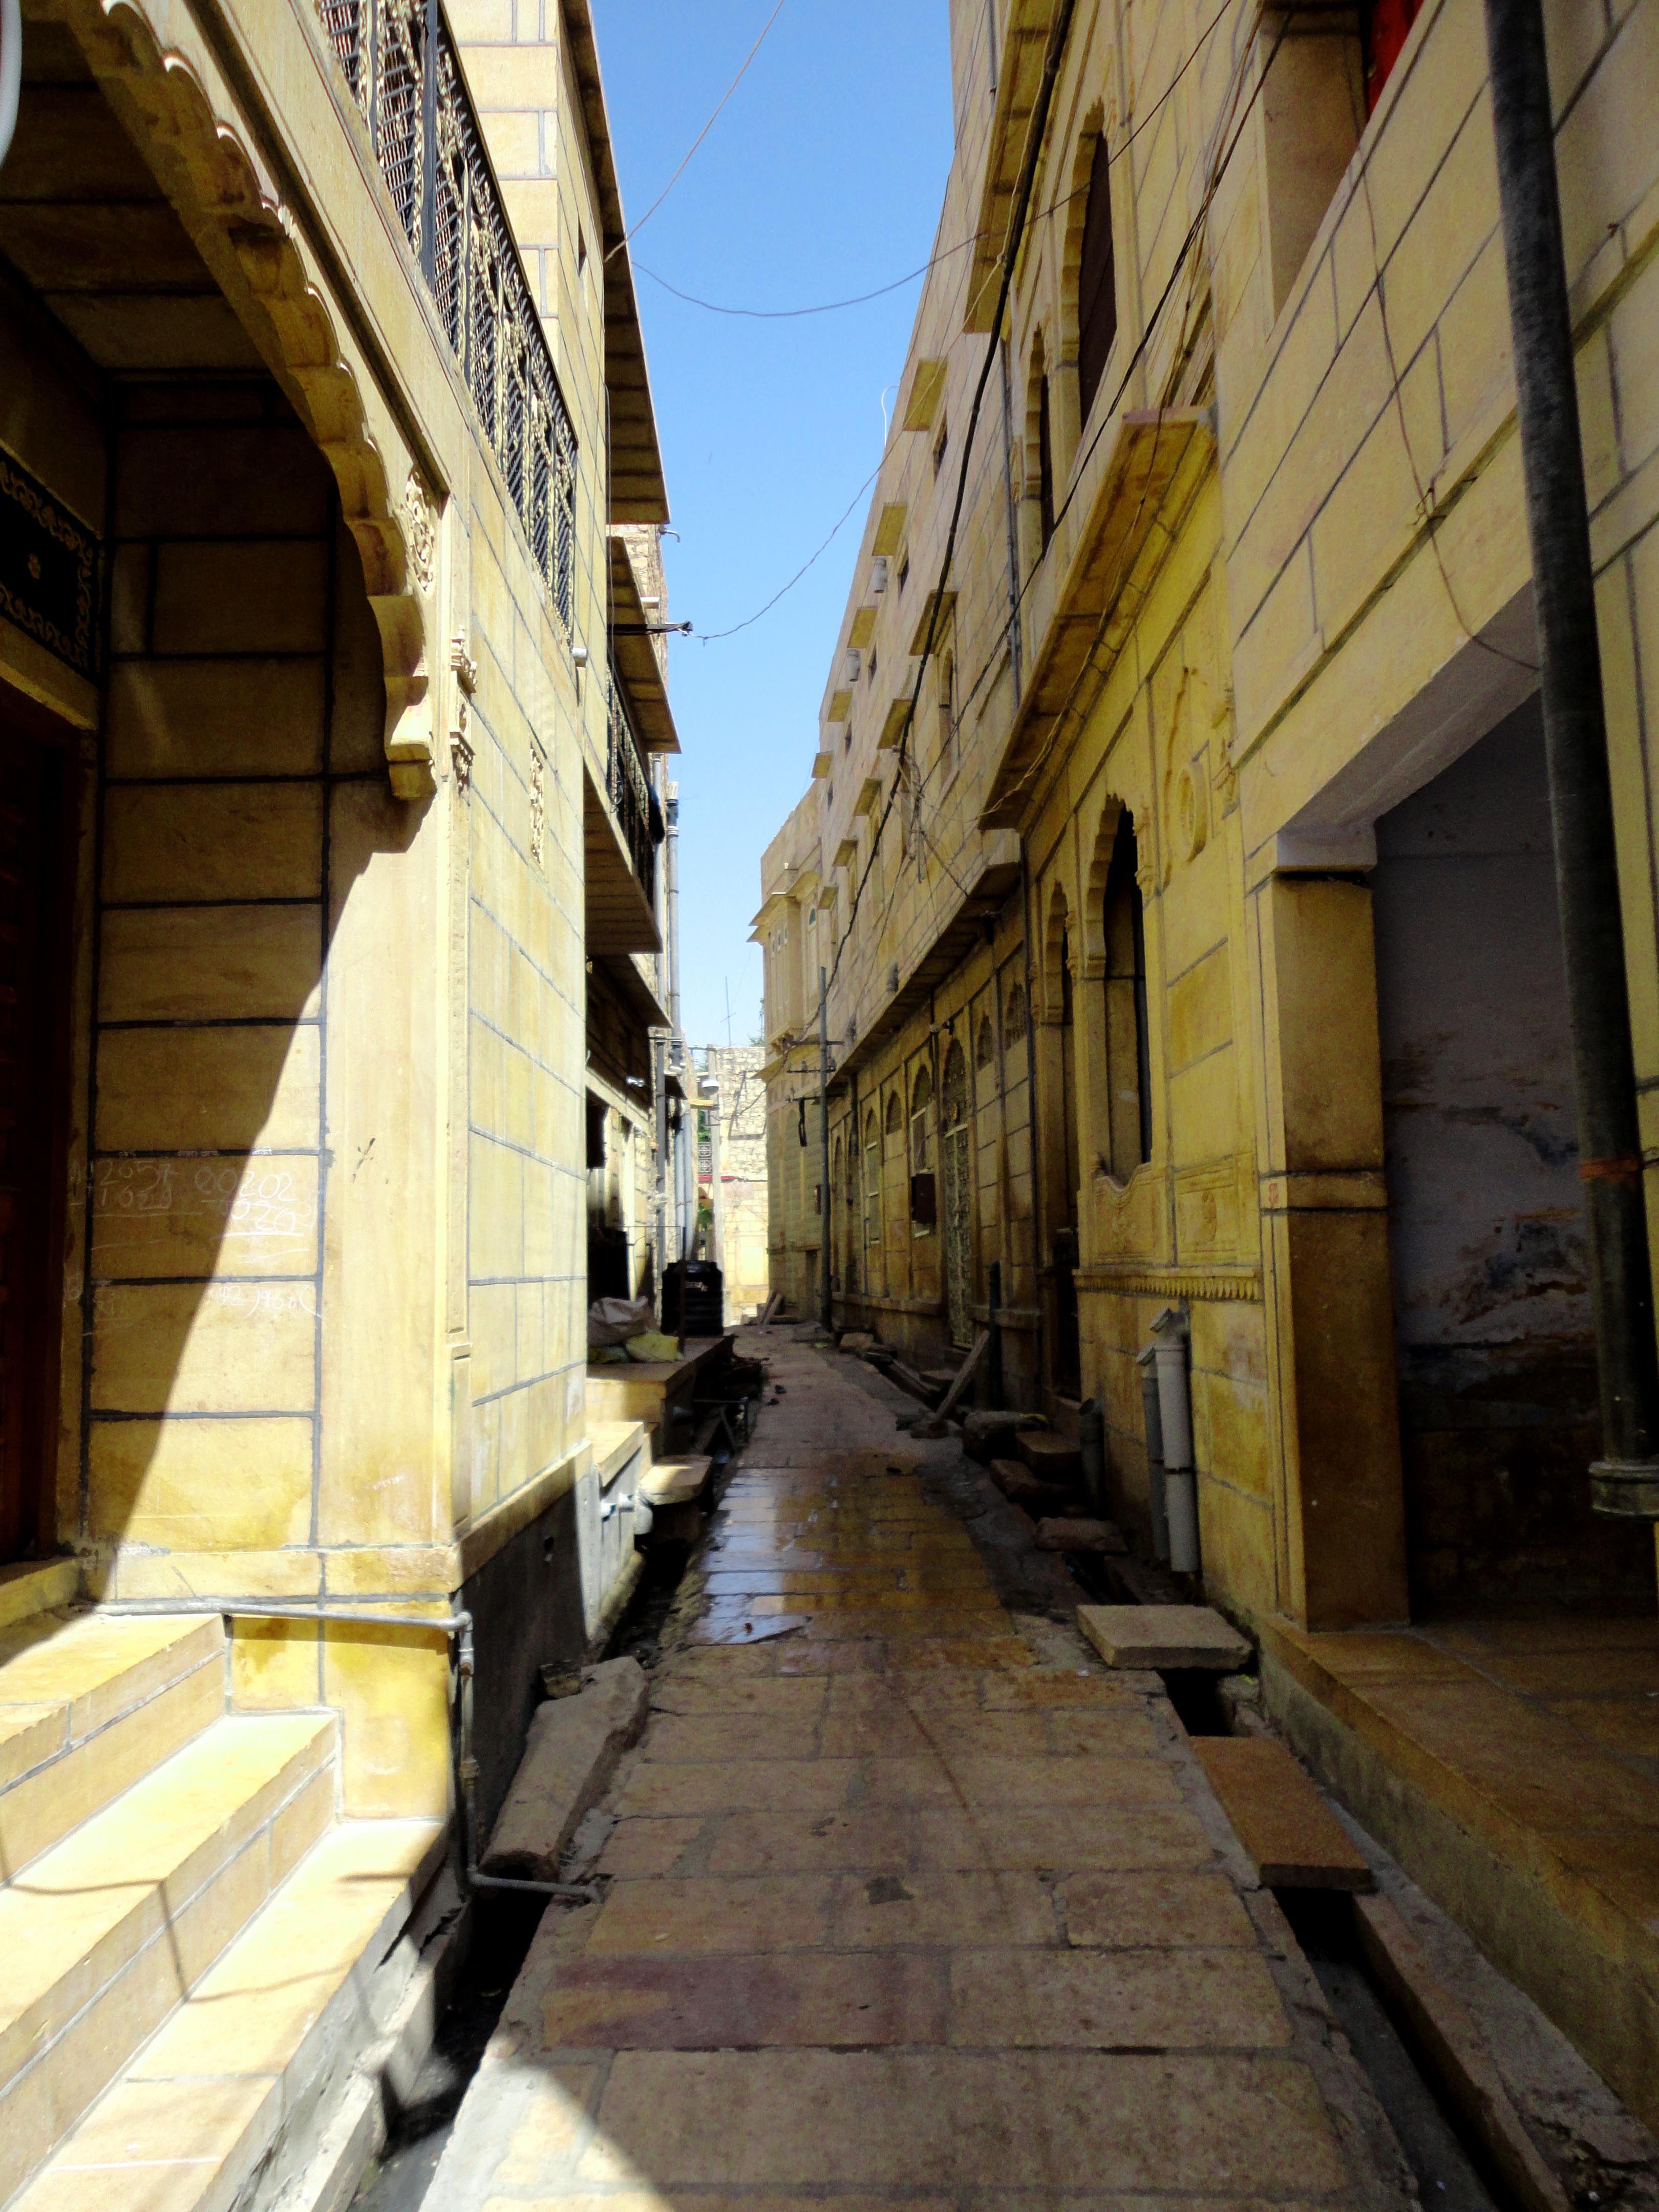 The quaint lanes of Jodhpur